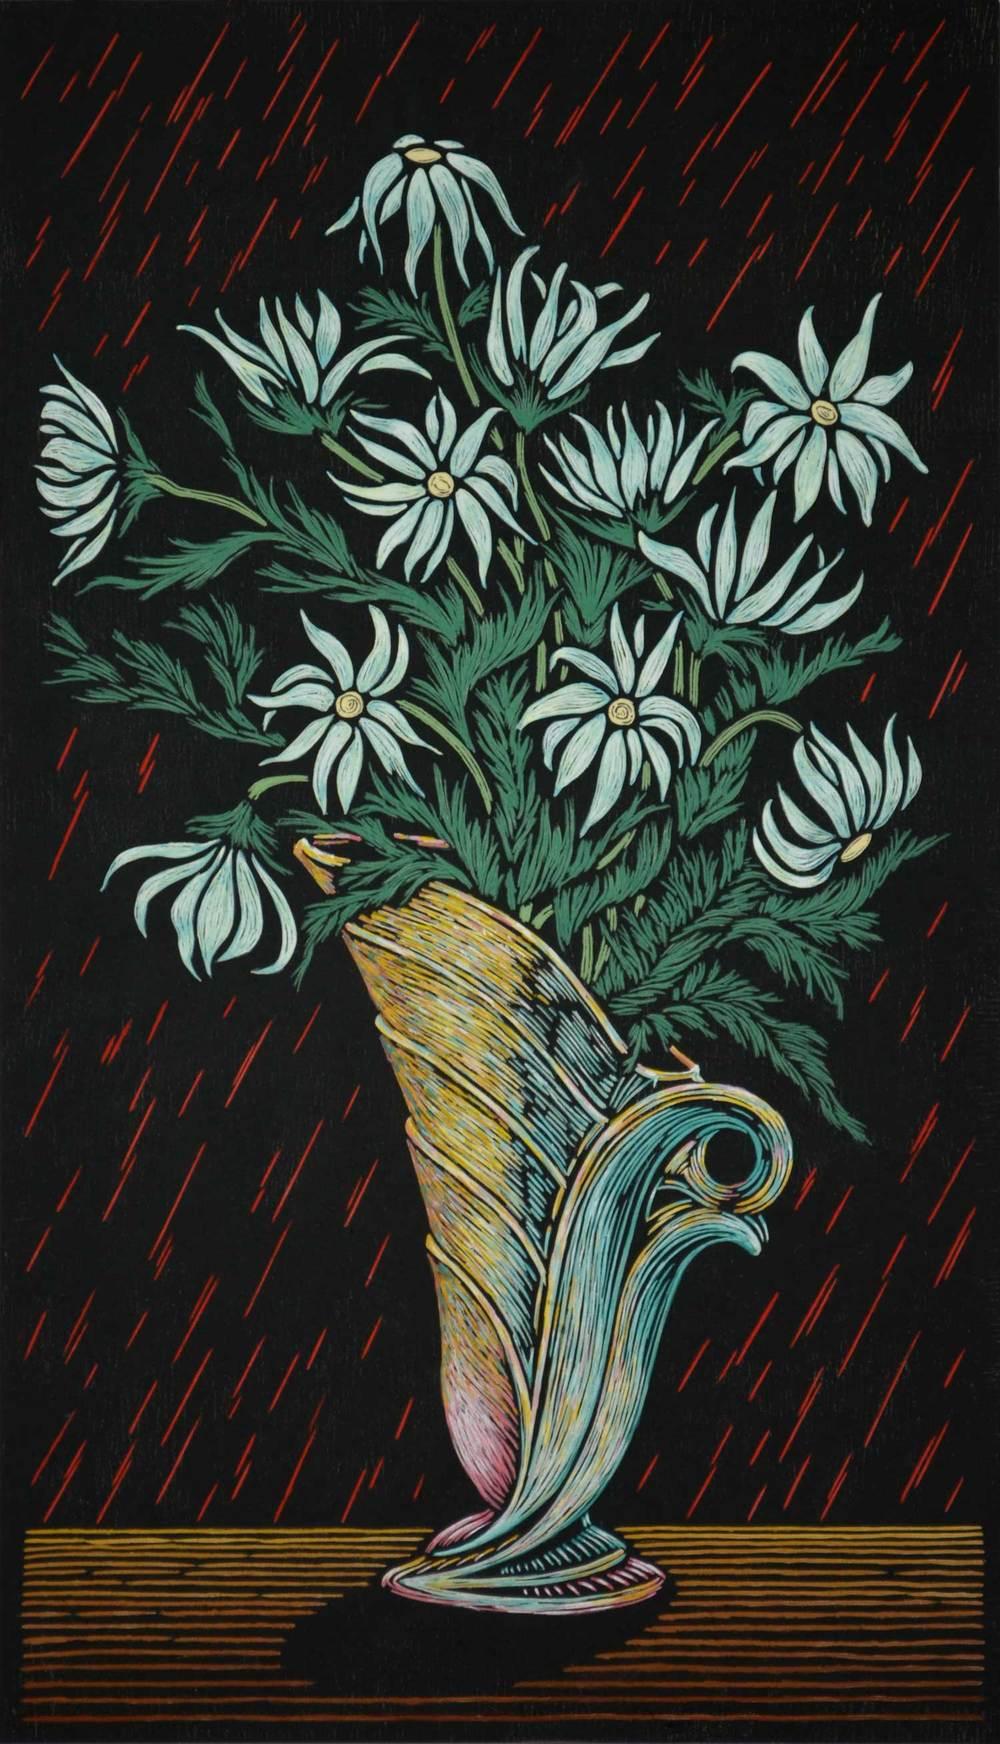 flannel-flowers-in-vase-linocut-rachel-newling.jpg